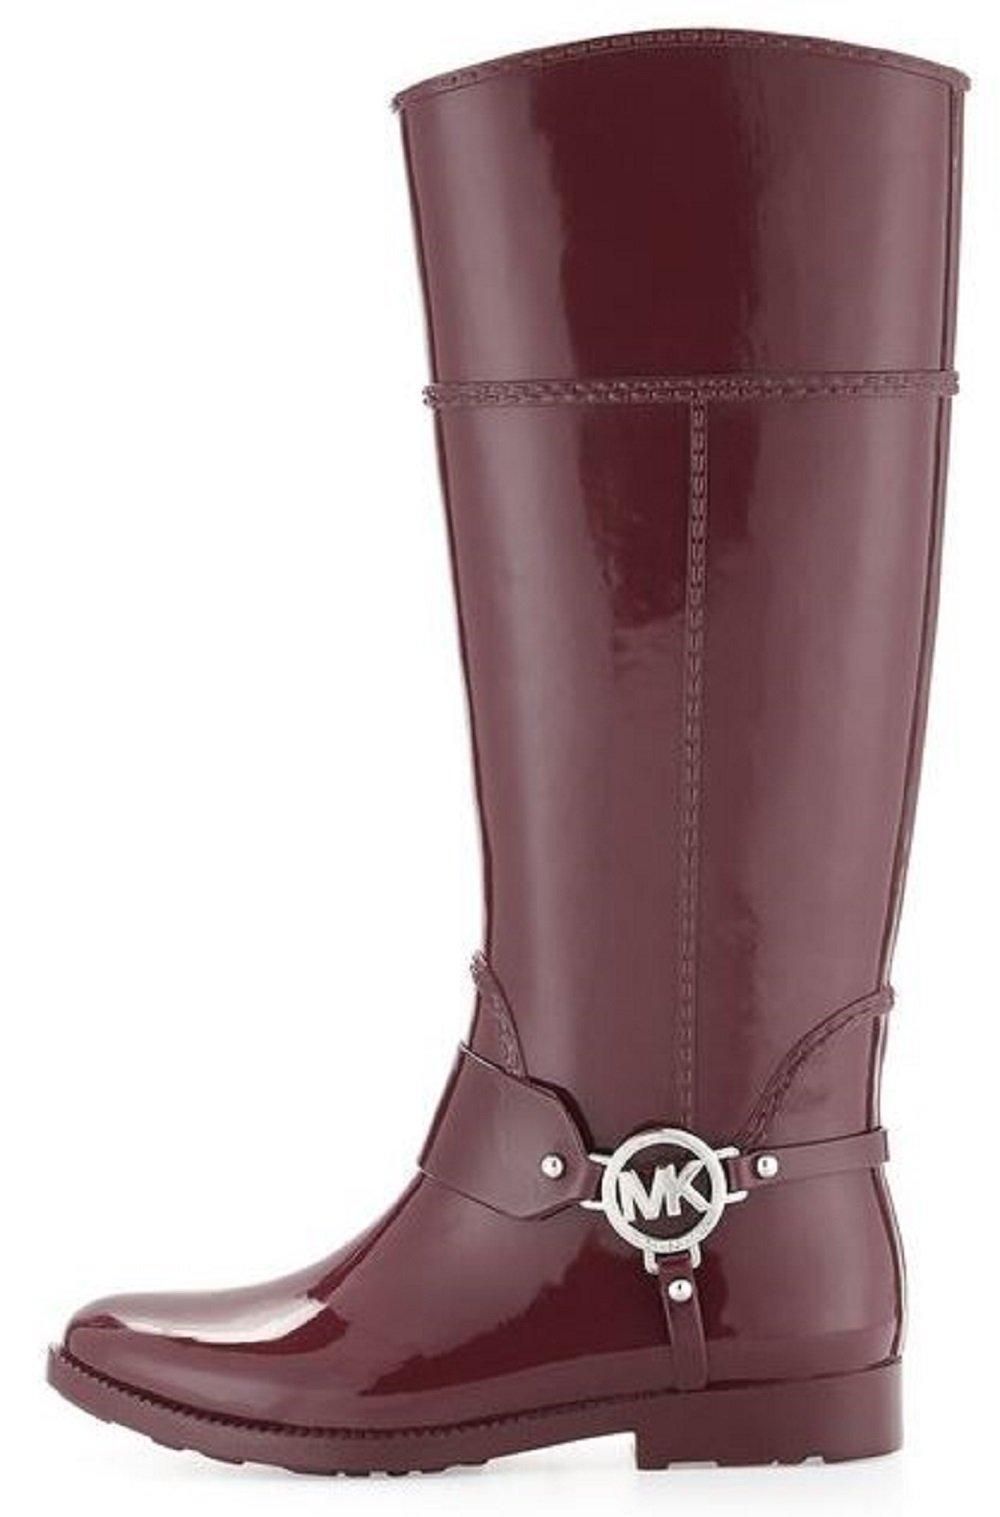 Michael Kors Womens Fulton Harness Tall Rainboot Closed Toe Mid-Calf Rainboots, Black, Size 10 by Michael Kors